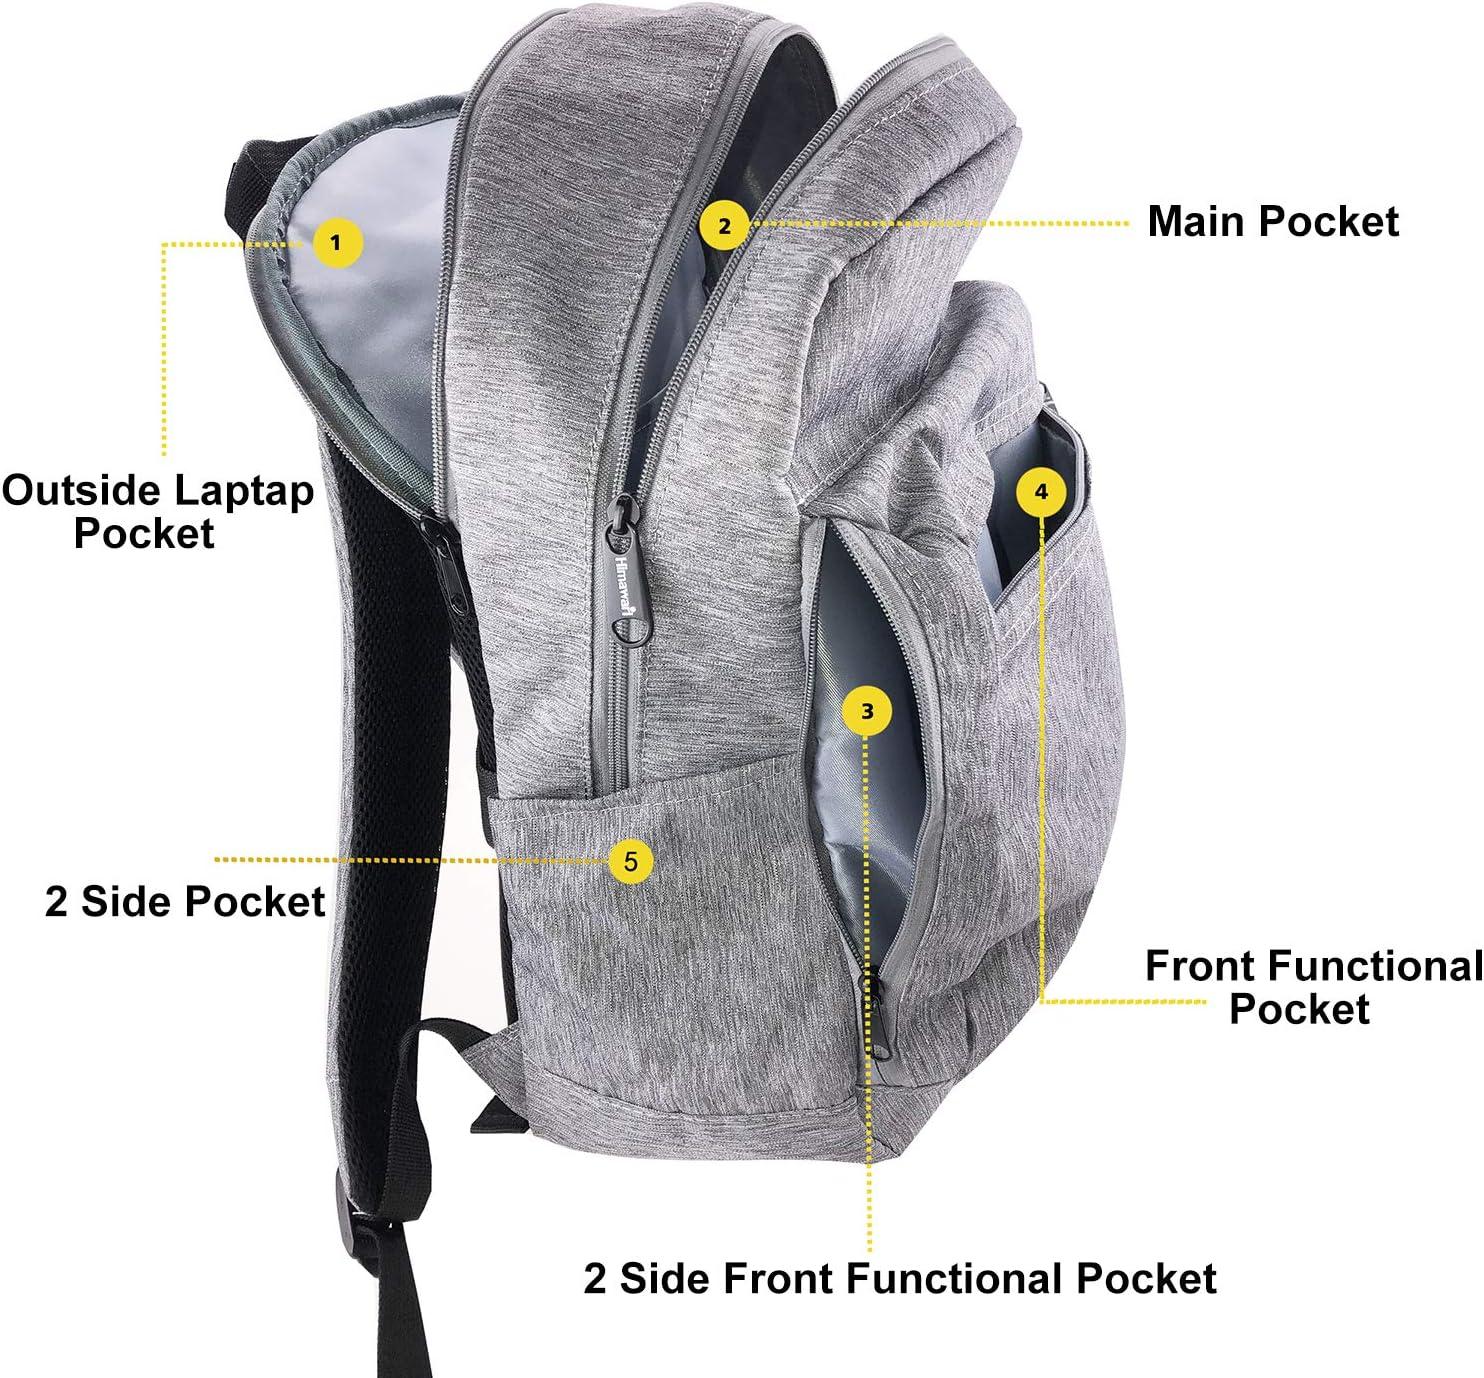 Hethrone Womens Mens Waterproof Laptop Backpack Fits 15.6 Inch Wide Open Lightweight Casual Daypack Anti Theft Work Rucksack School Backpack Bag Black